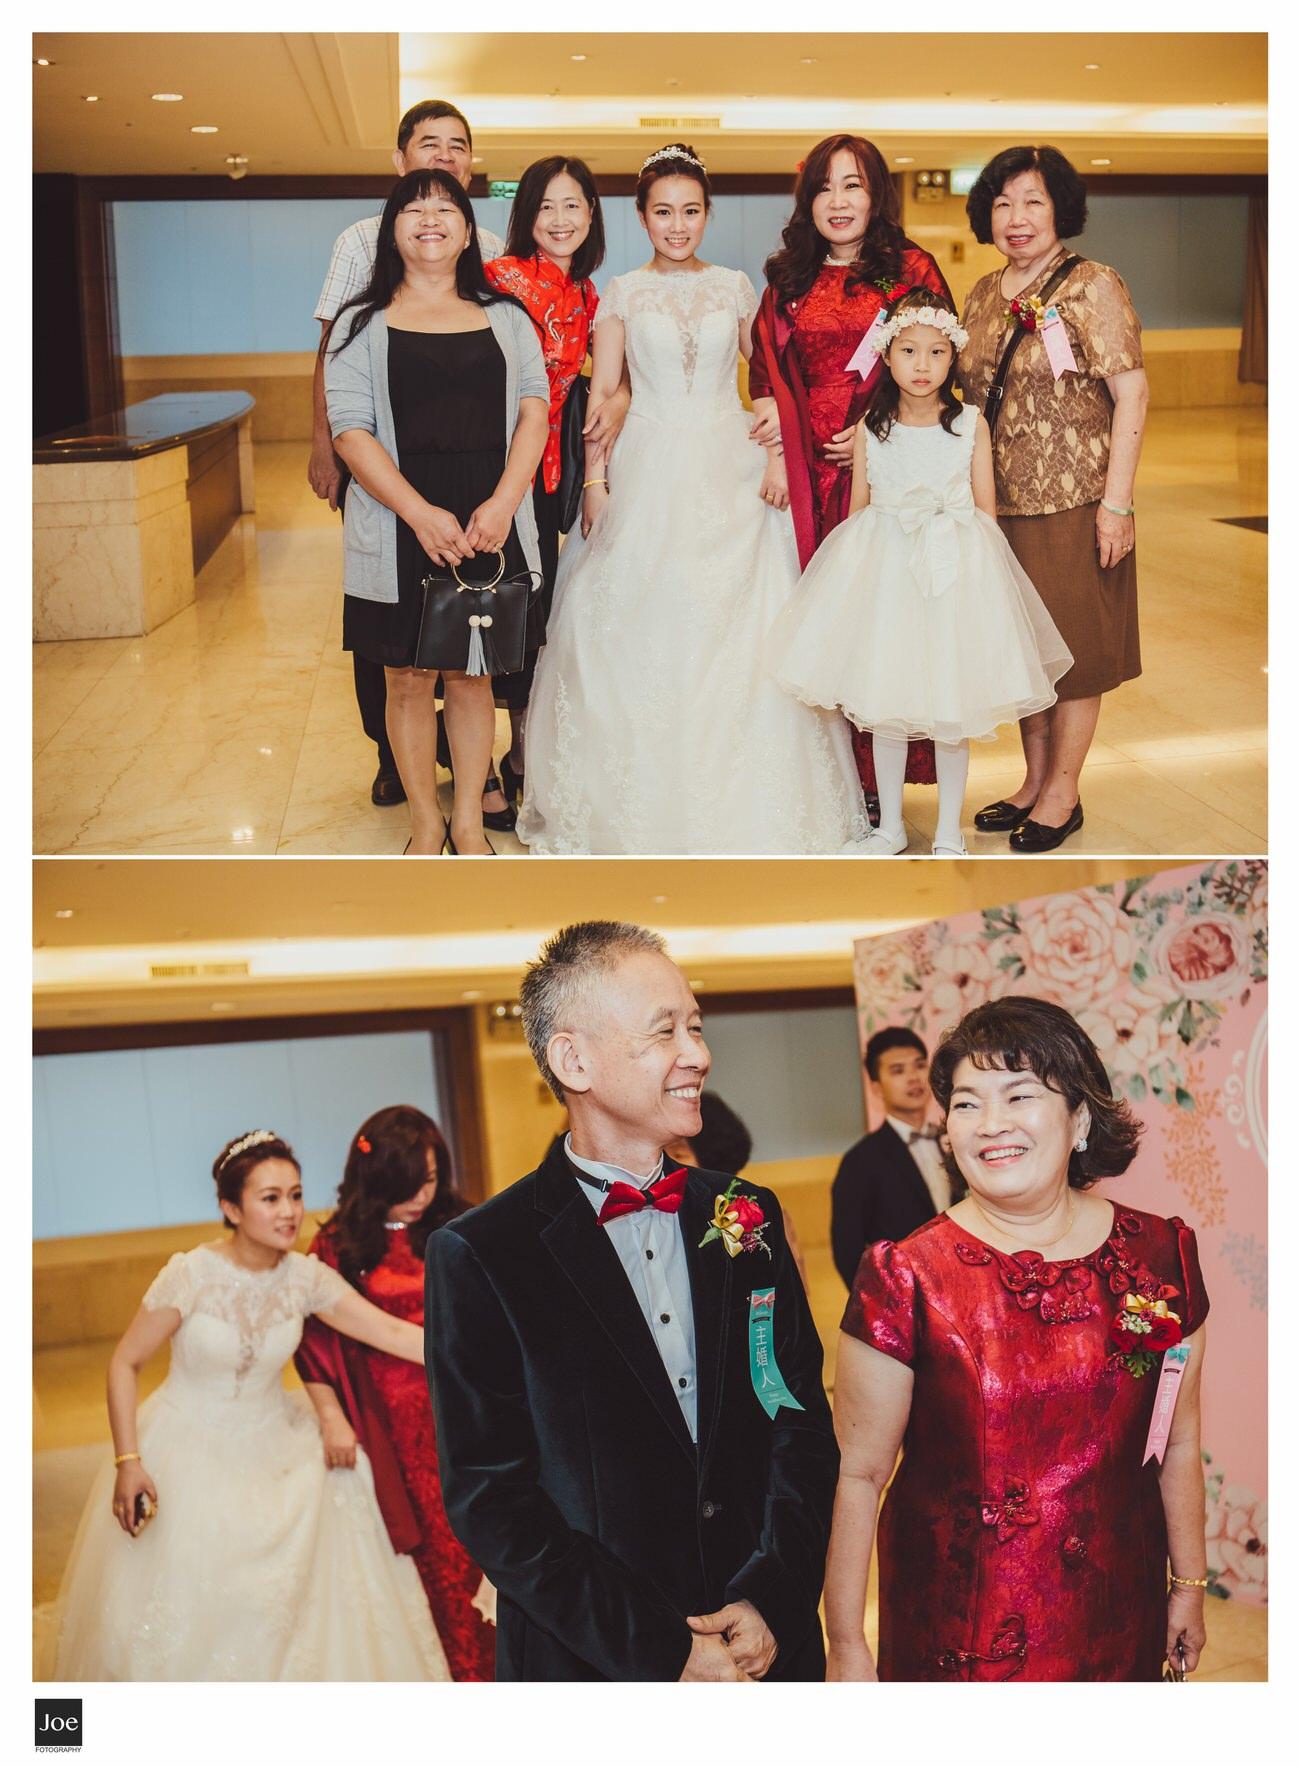 sunworld-dynasty-hotel-taipei-wedding-photo-joe-fotography-angel-jay-066.jpg